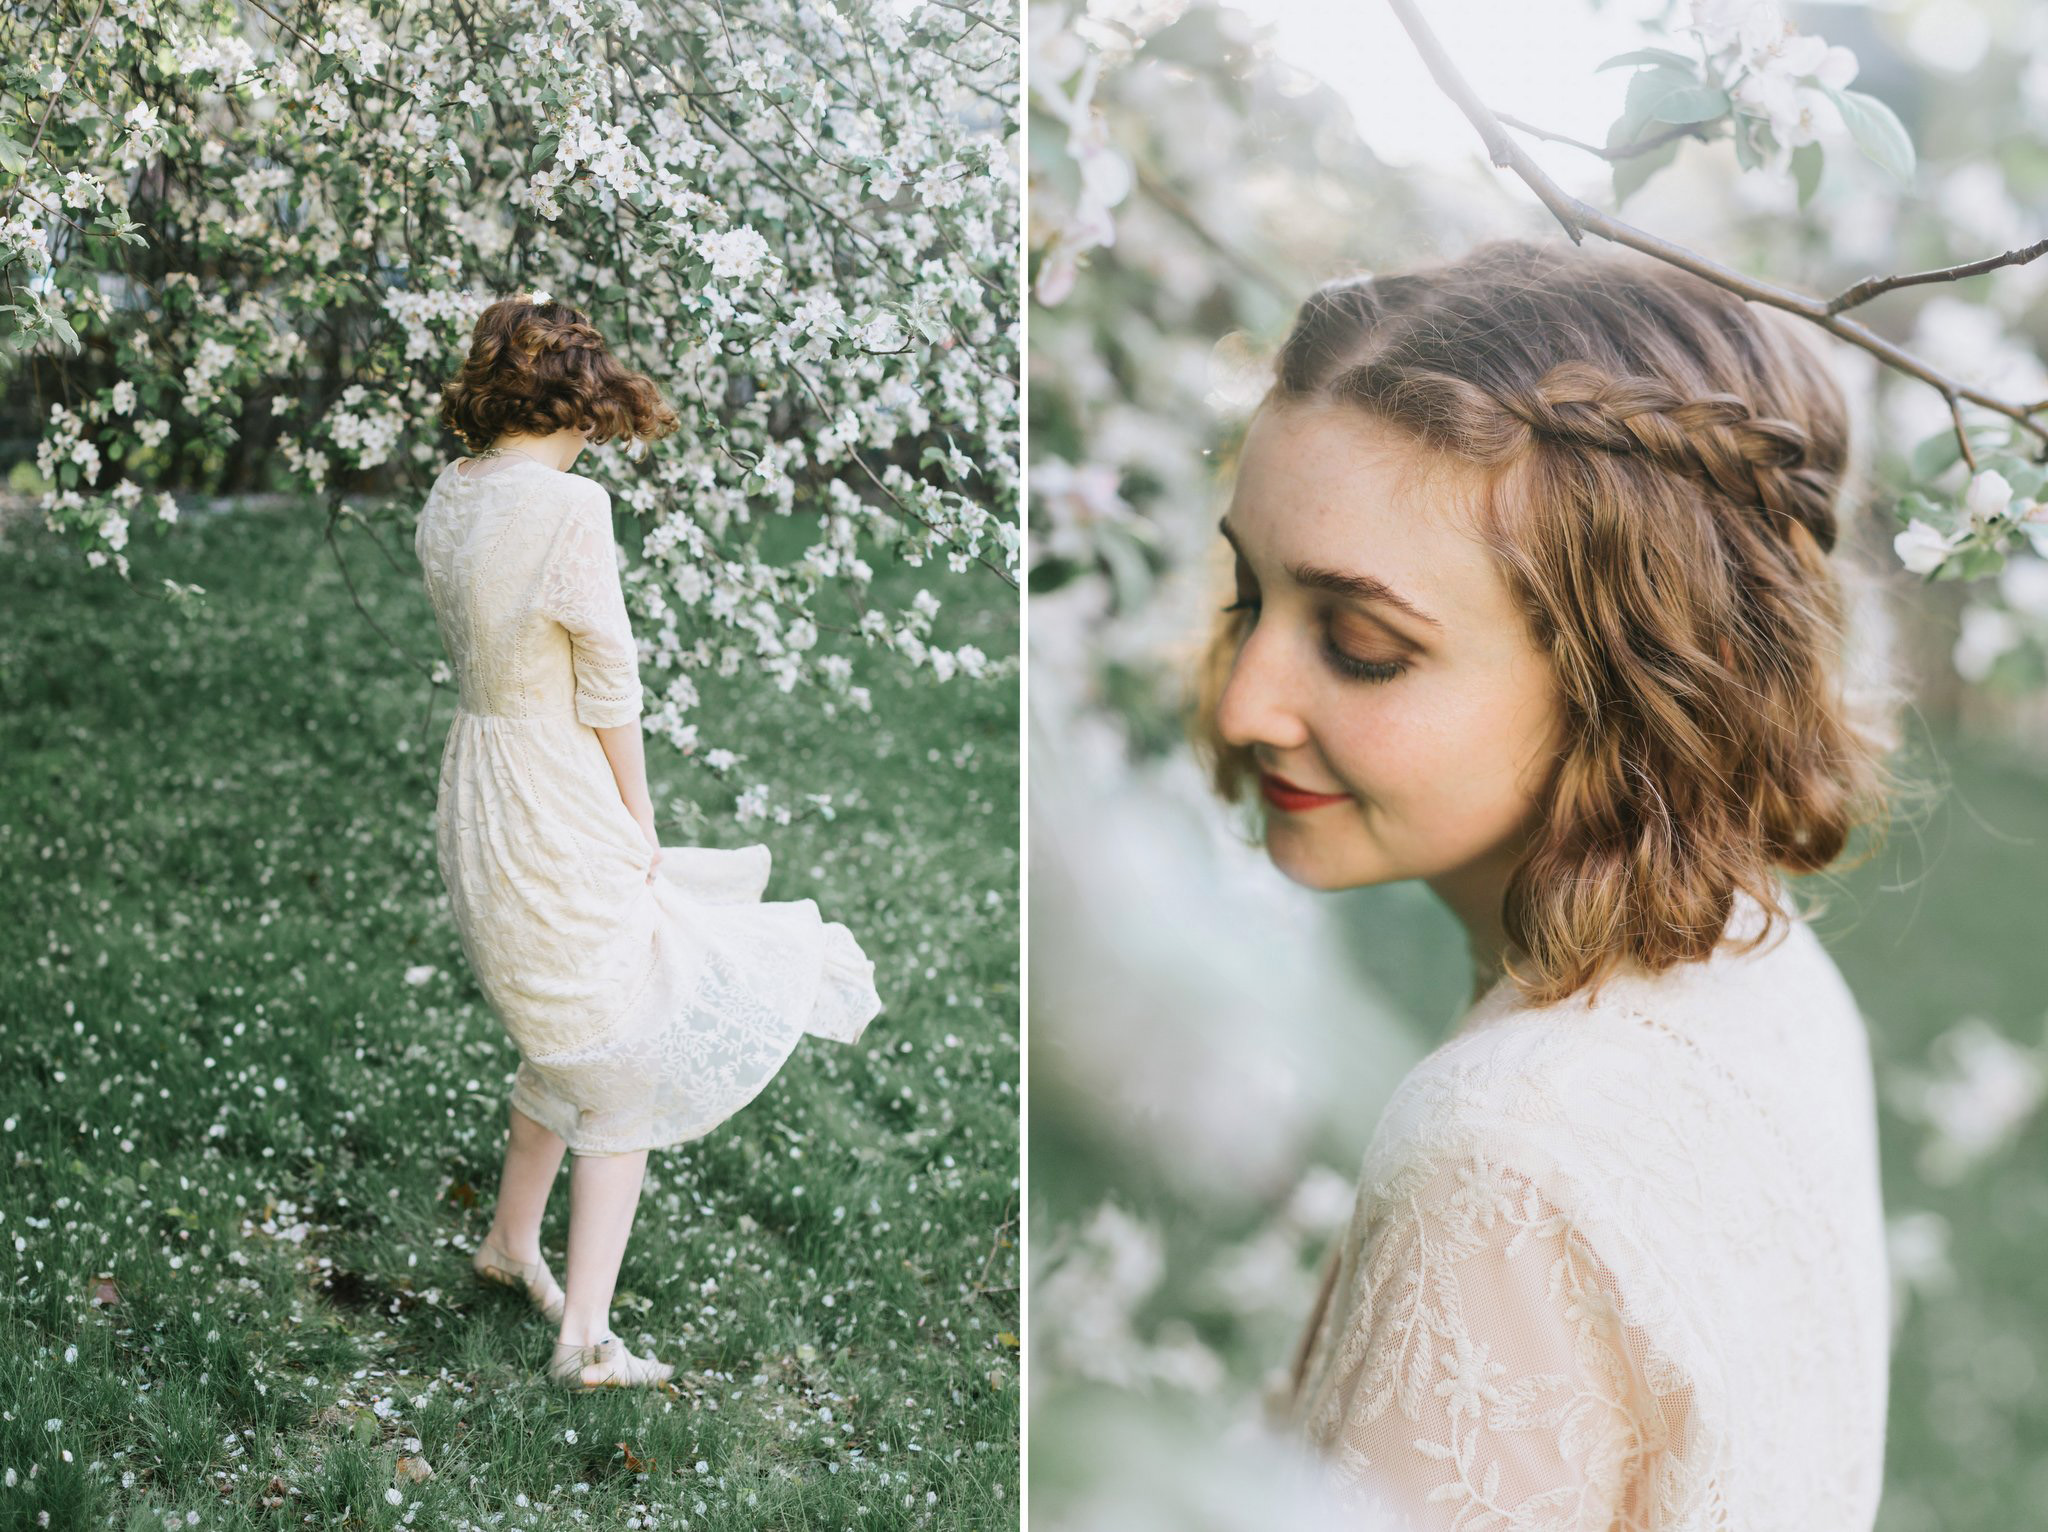 Spring_Fashion_Cherry_Blossom_NYC_7.jpg